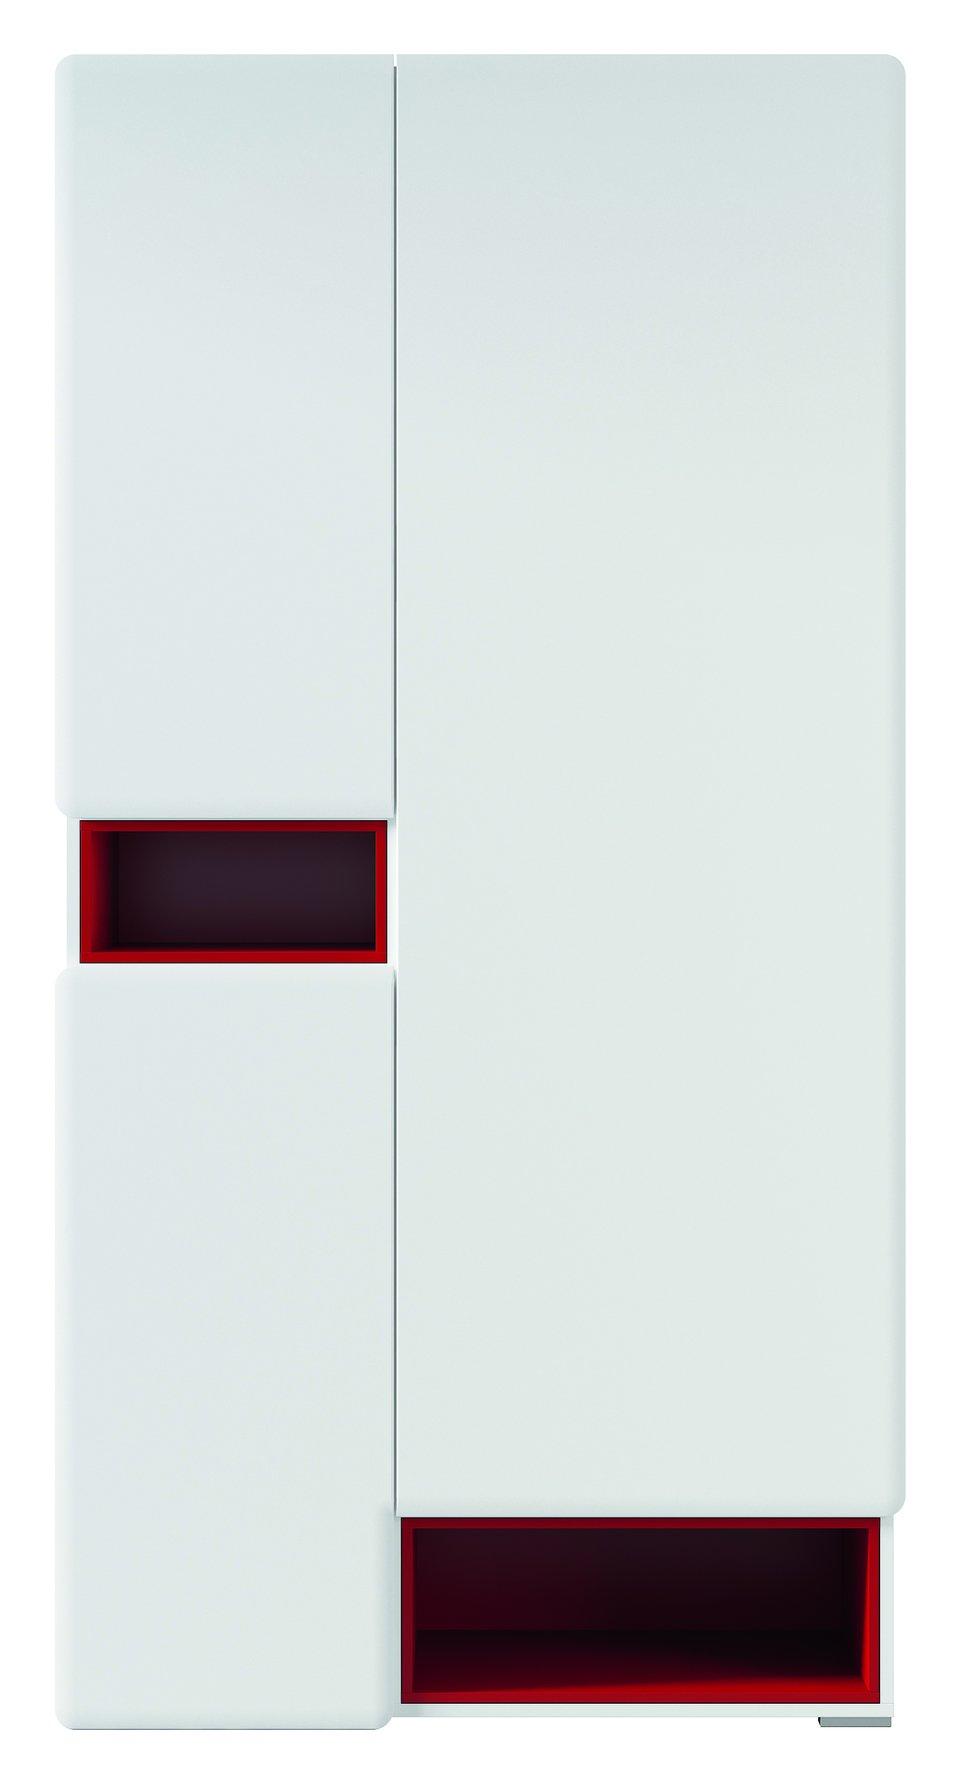 Kolekcja Possi Air_Black Red White (6).jpg